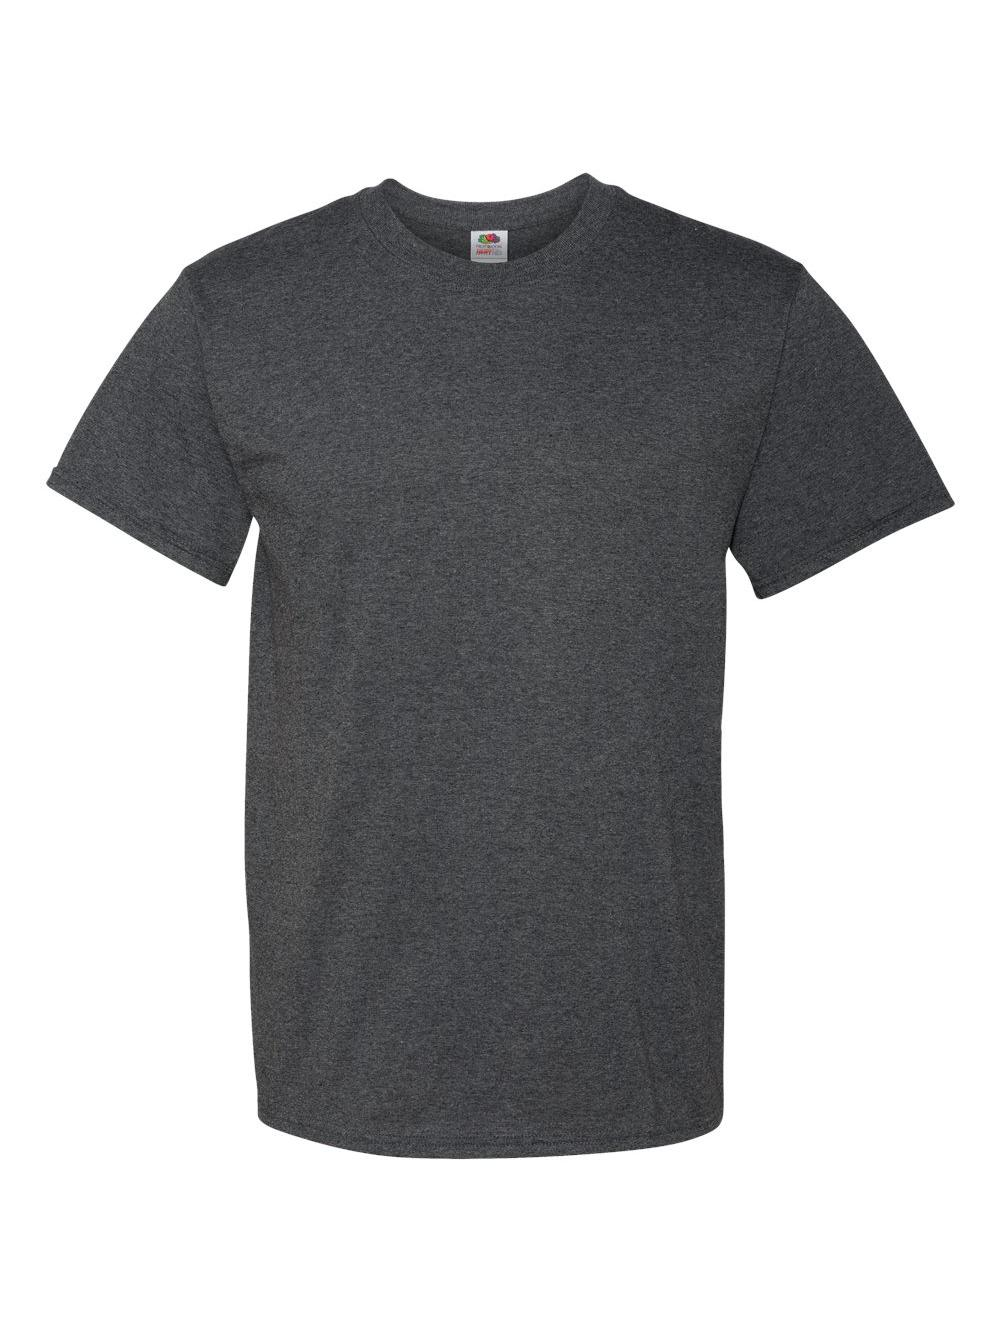 Fruit-of-the-Loom-HD-Cotton-Short-Sleeve-T-Shirt-3930R thumbnail 18